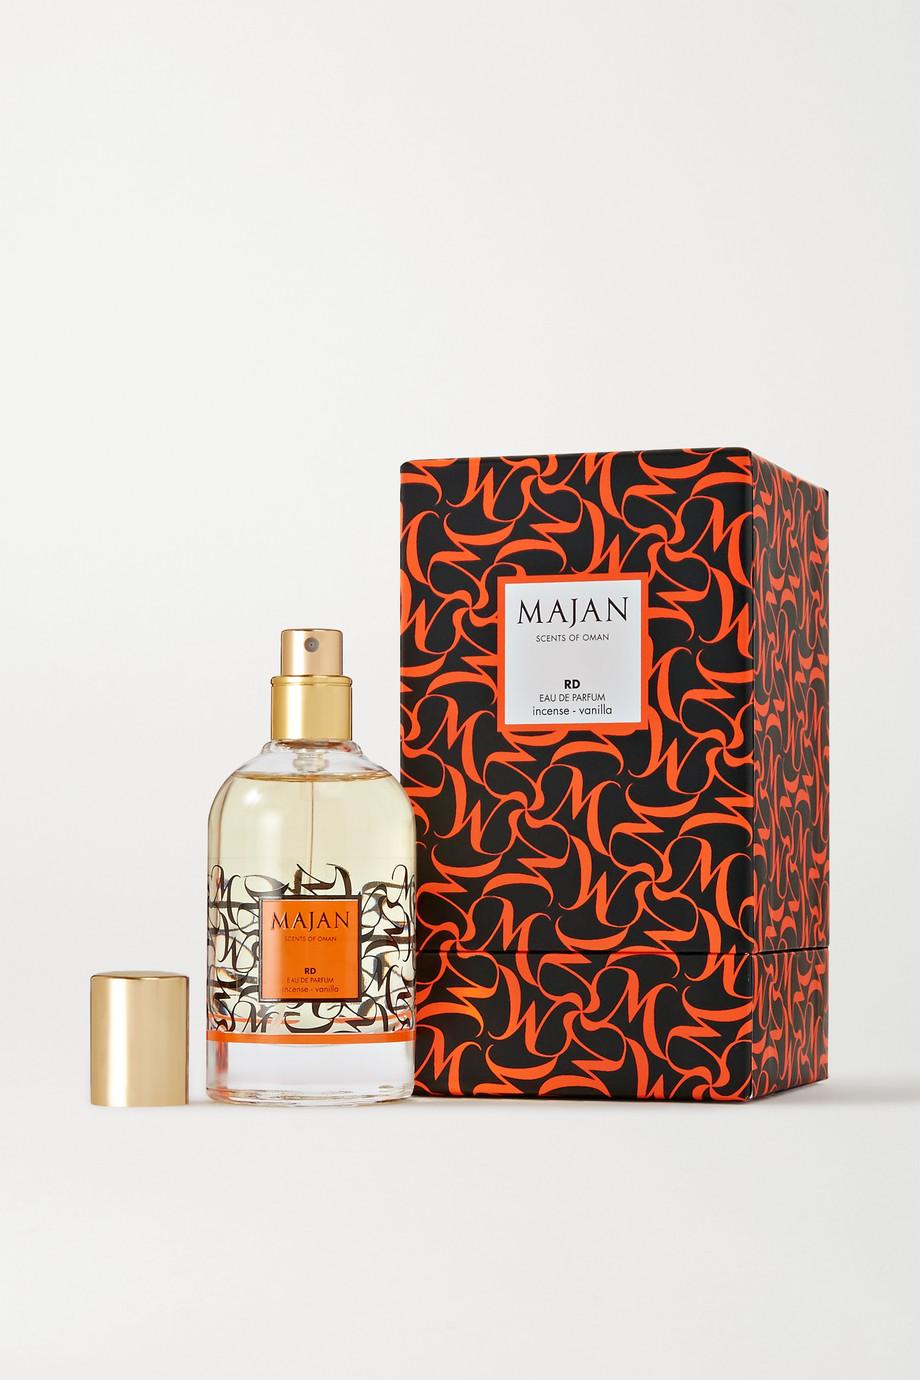 MAJAN RD, 50 ml – Eau de Parfum